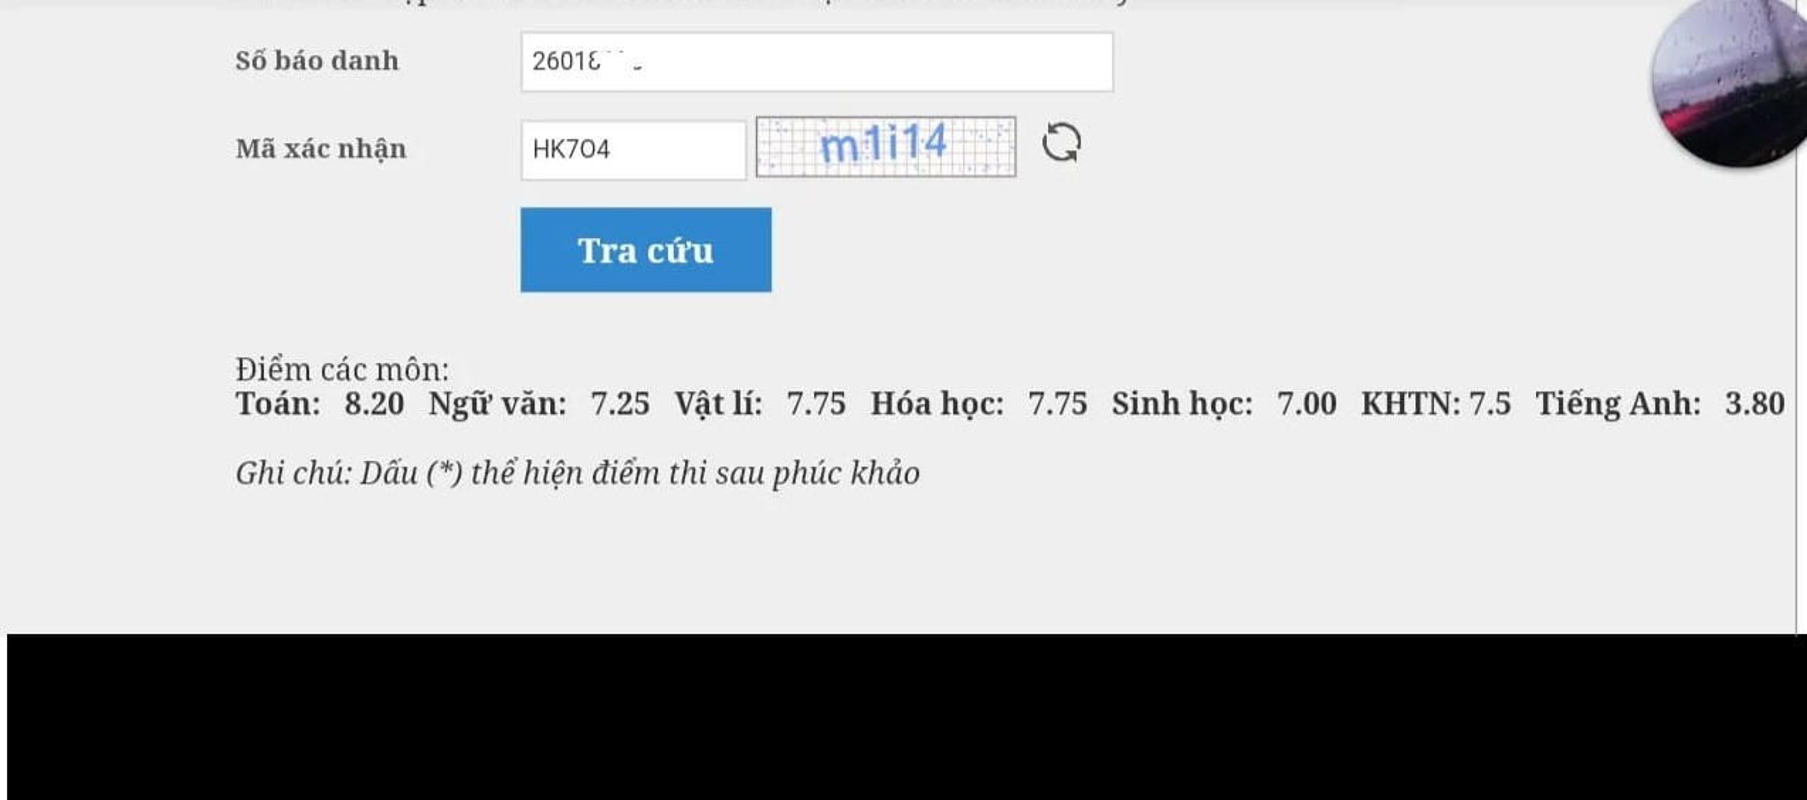 Teen 2K3 khoe diem thi tot nghiep THPT voi loat cam xuc kho ta-Hinh-3